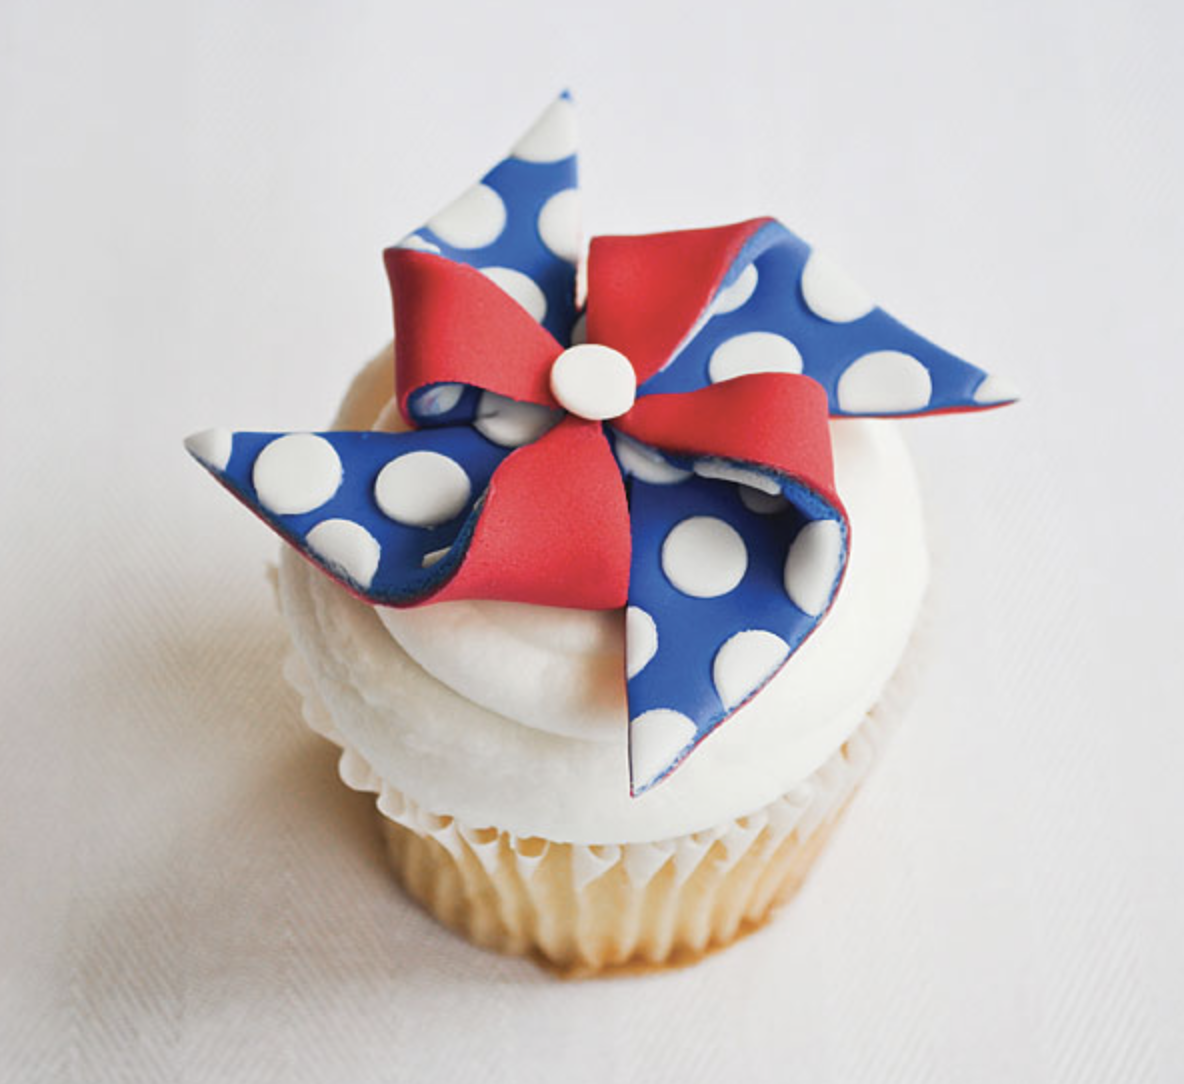 Spot your favourite polka dot cakes